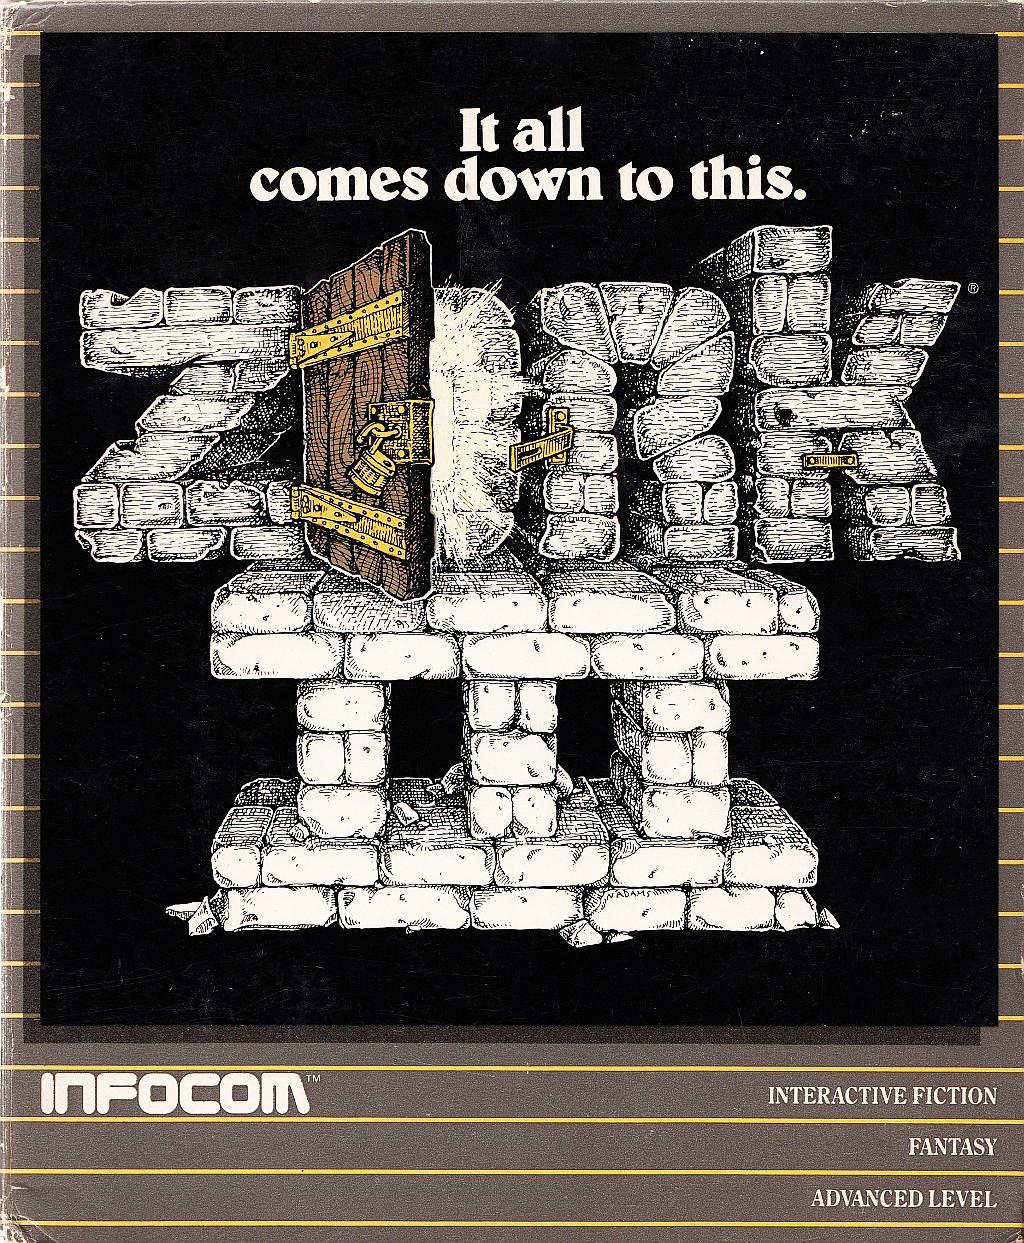 Zork III, a computer text adventure game by Infocom